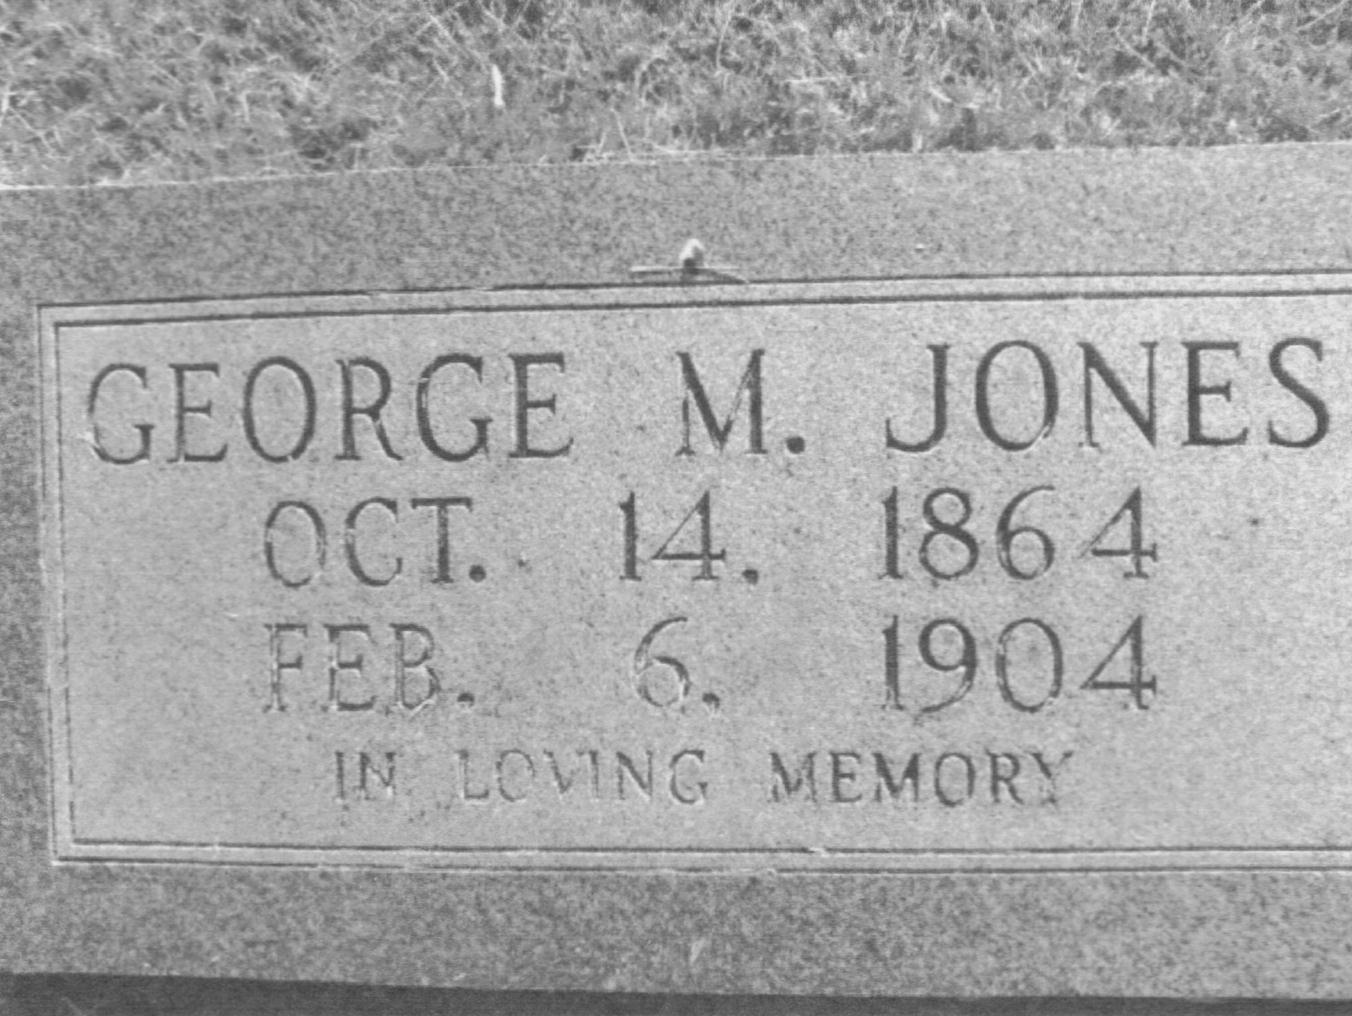 George Martin Jones